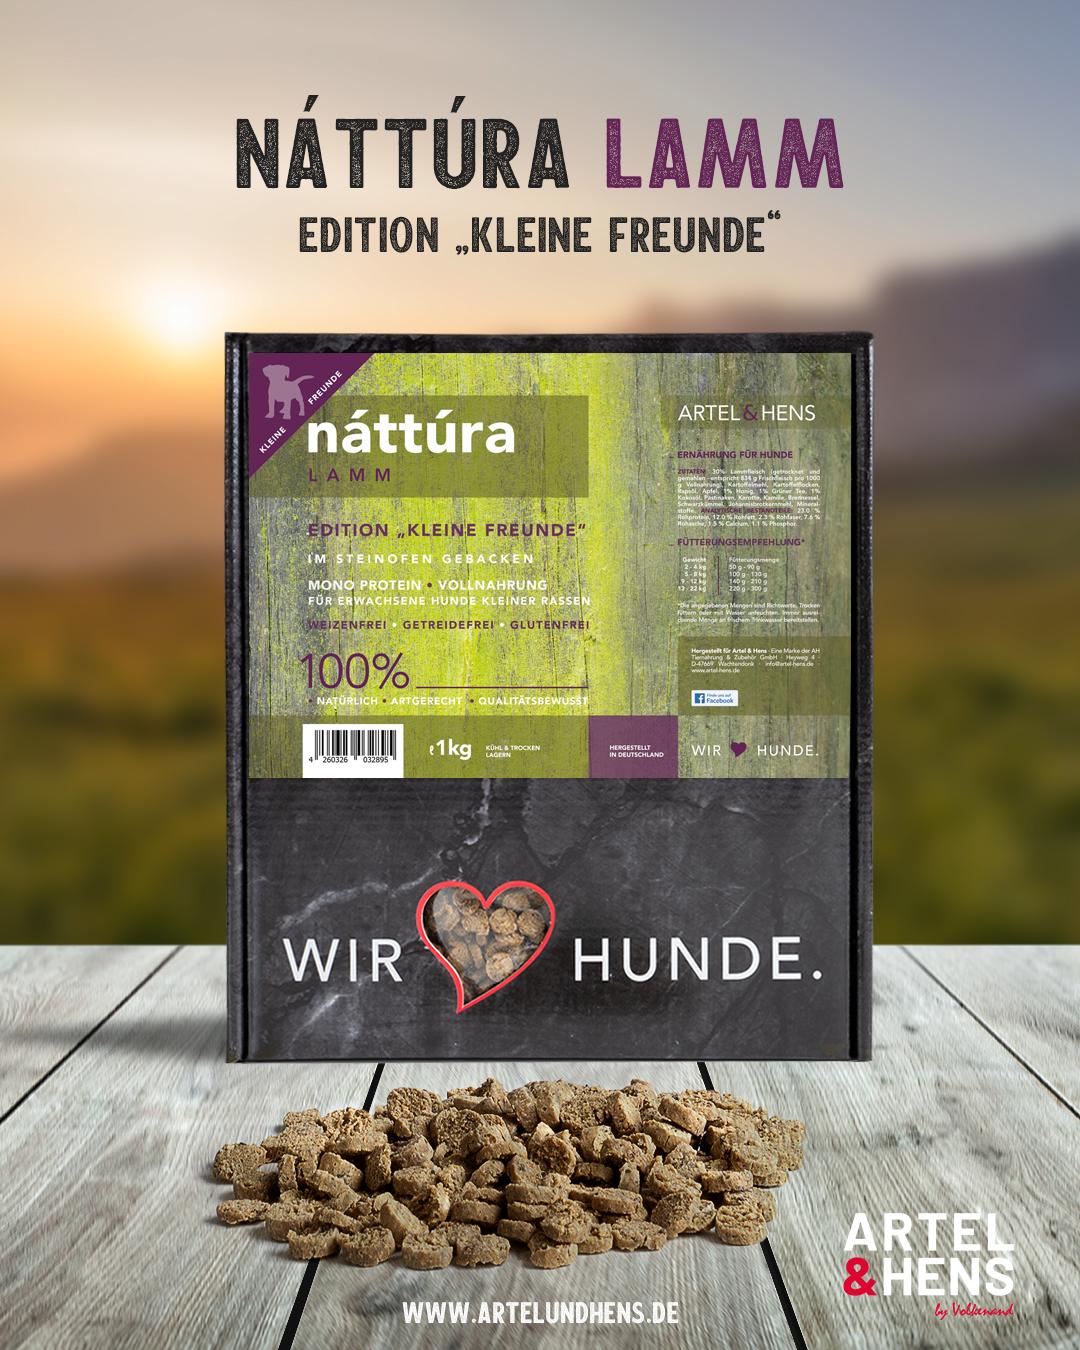 Artel & Hens Trockenfutter - Náttúra - kleine Freunde - Lamm